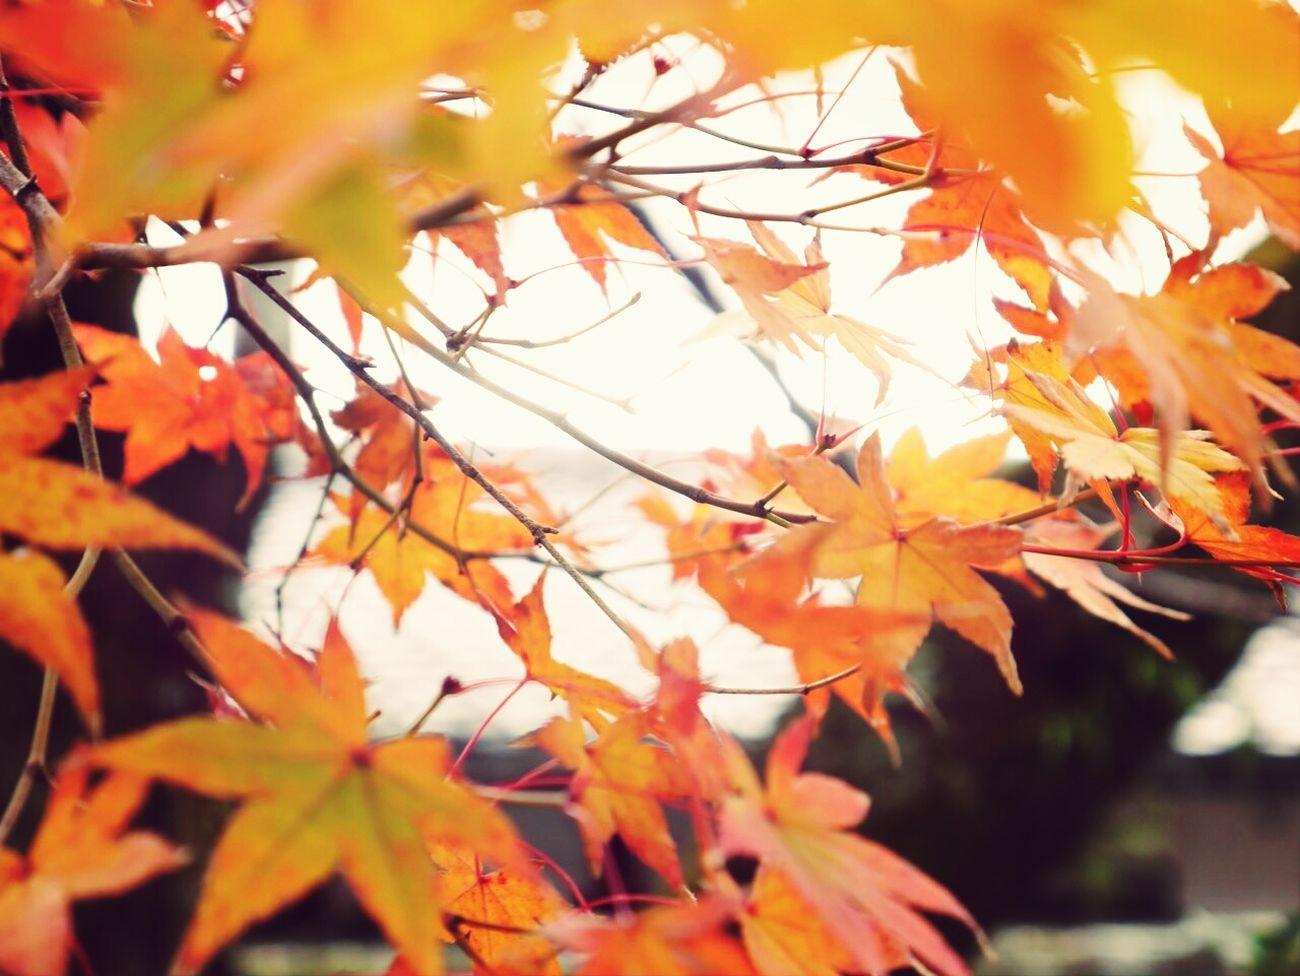 Kyoto,japan Taking Photos Travel Miuntains 先日の雨でほとんどもうなかった(;_;)